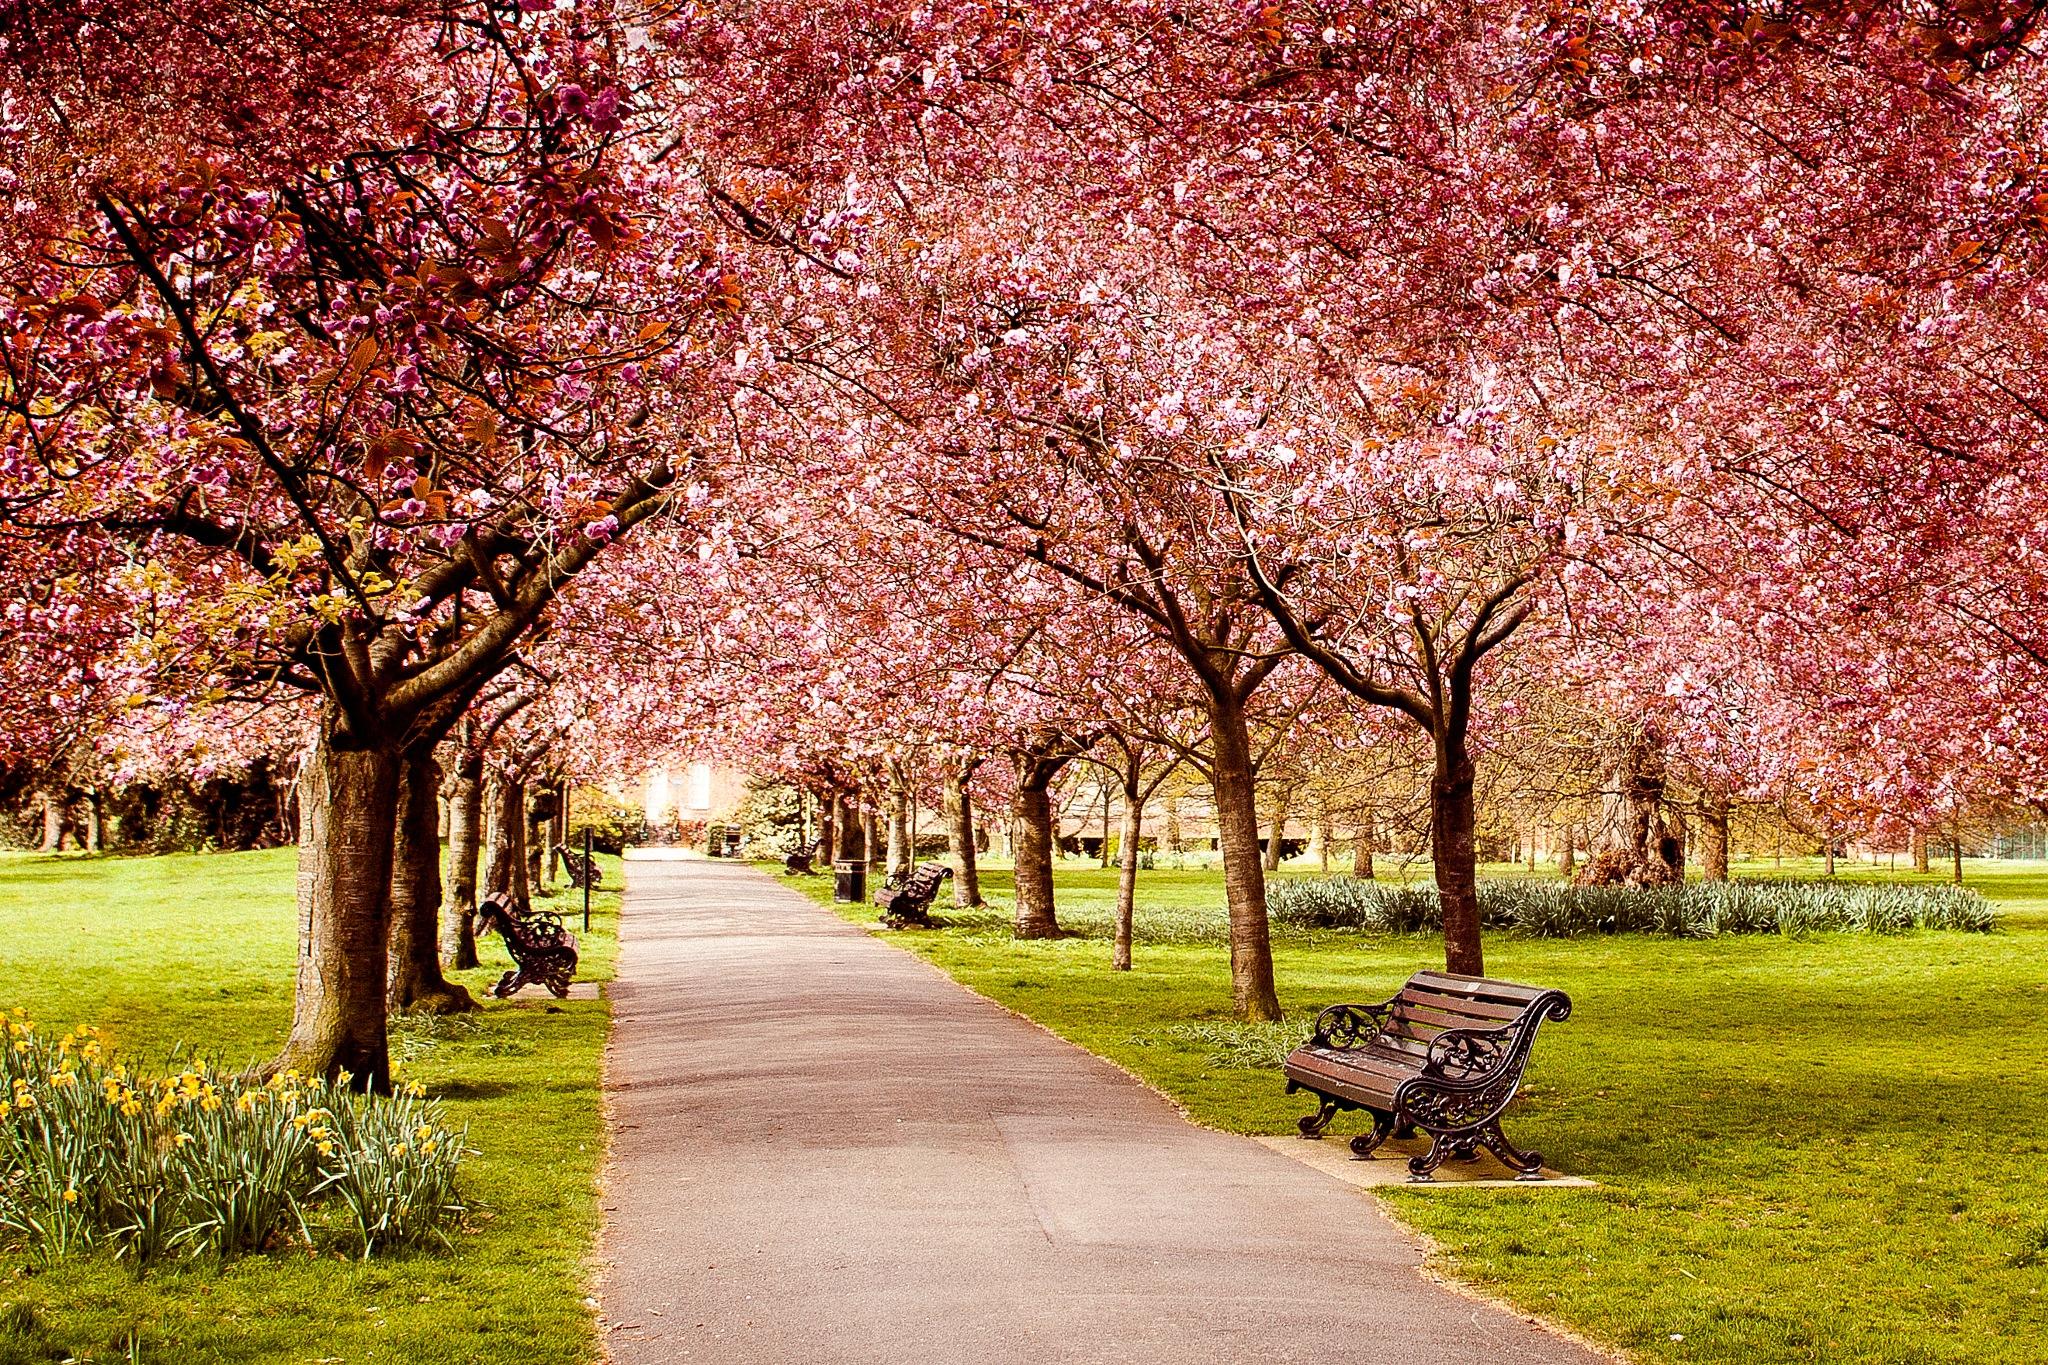 Spring in Greenwich by edita.toma